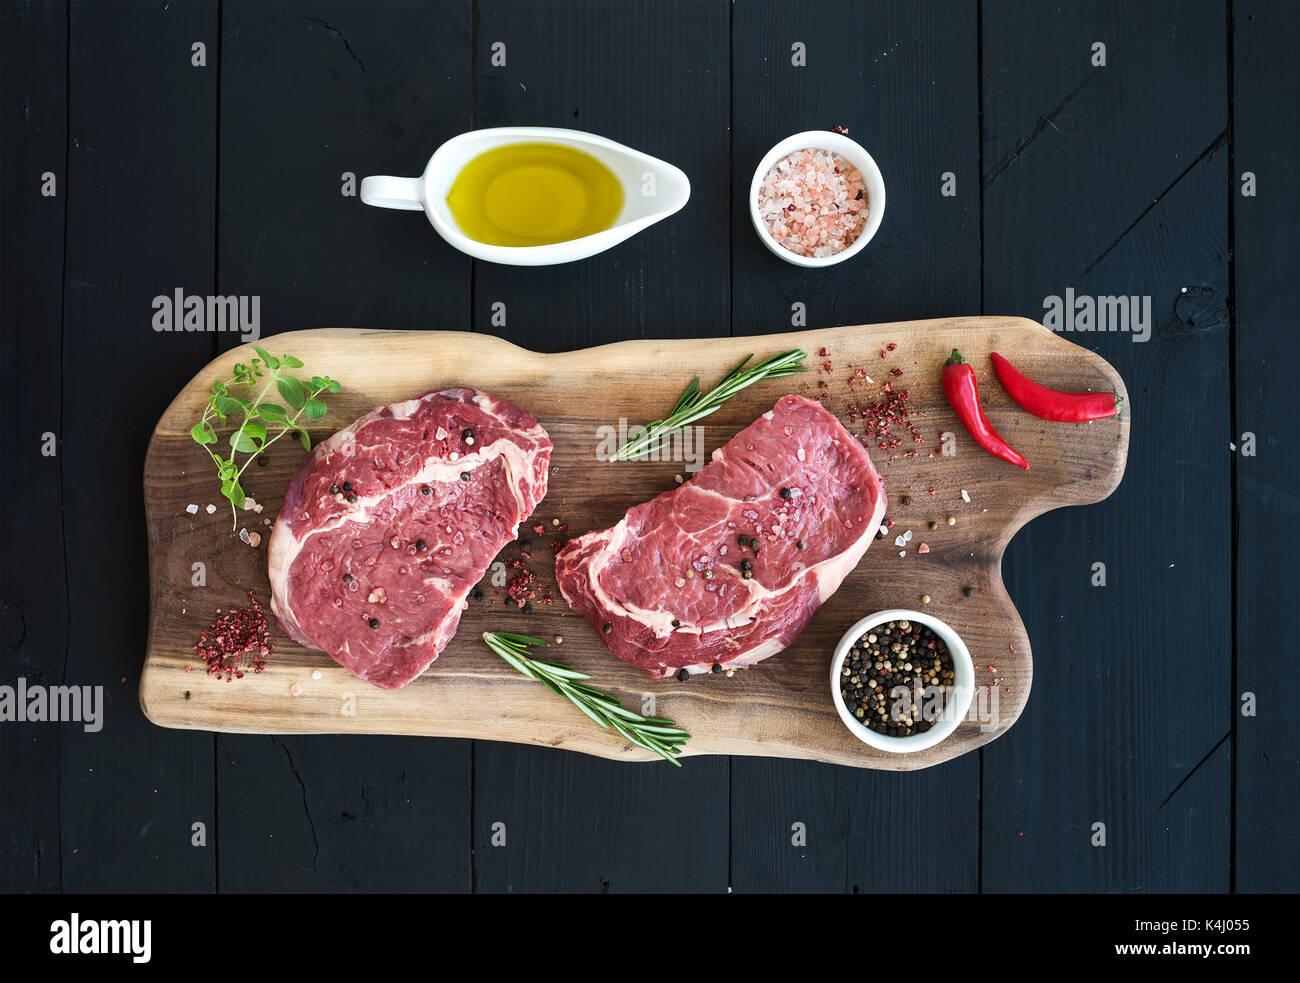 Raw fresh meat Ribeye steak entrecote and seasonings on cutting board Stock Photo